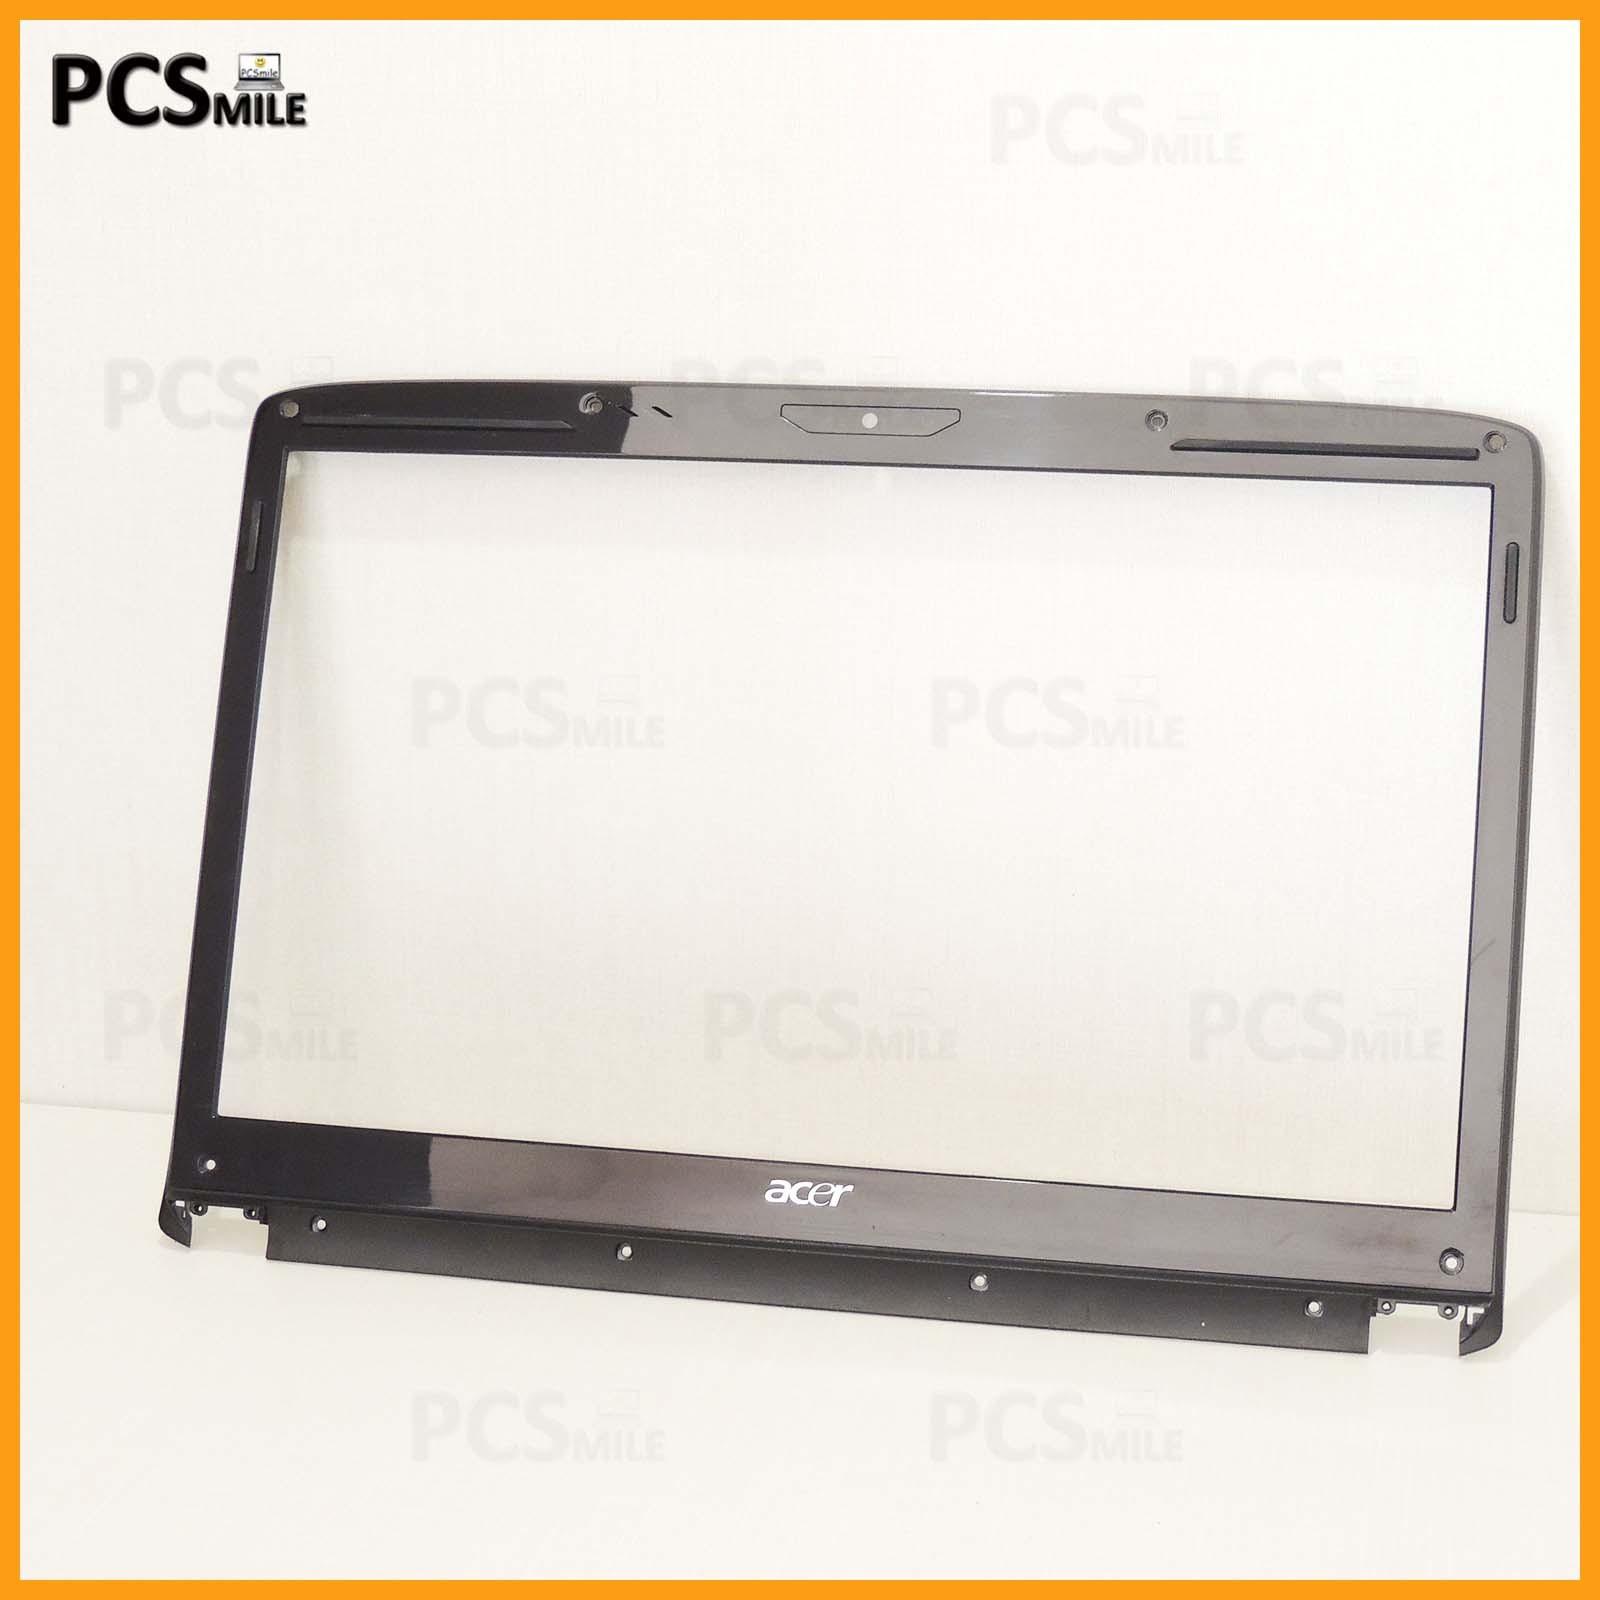 Cornice schermo Acer Aspire 6530 P/N: DZC38ZK2LBTN10081029-02 REV: 3A